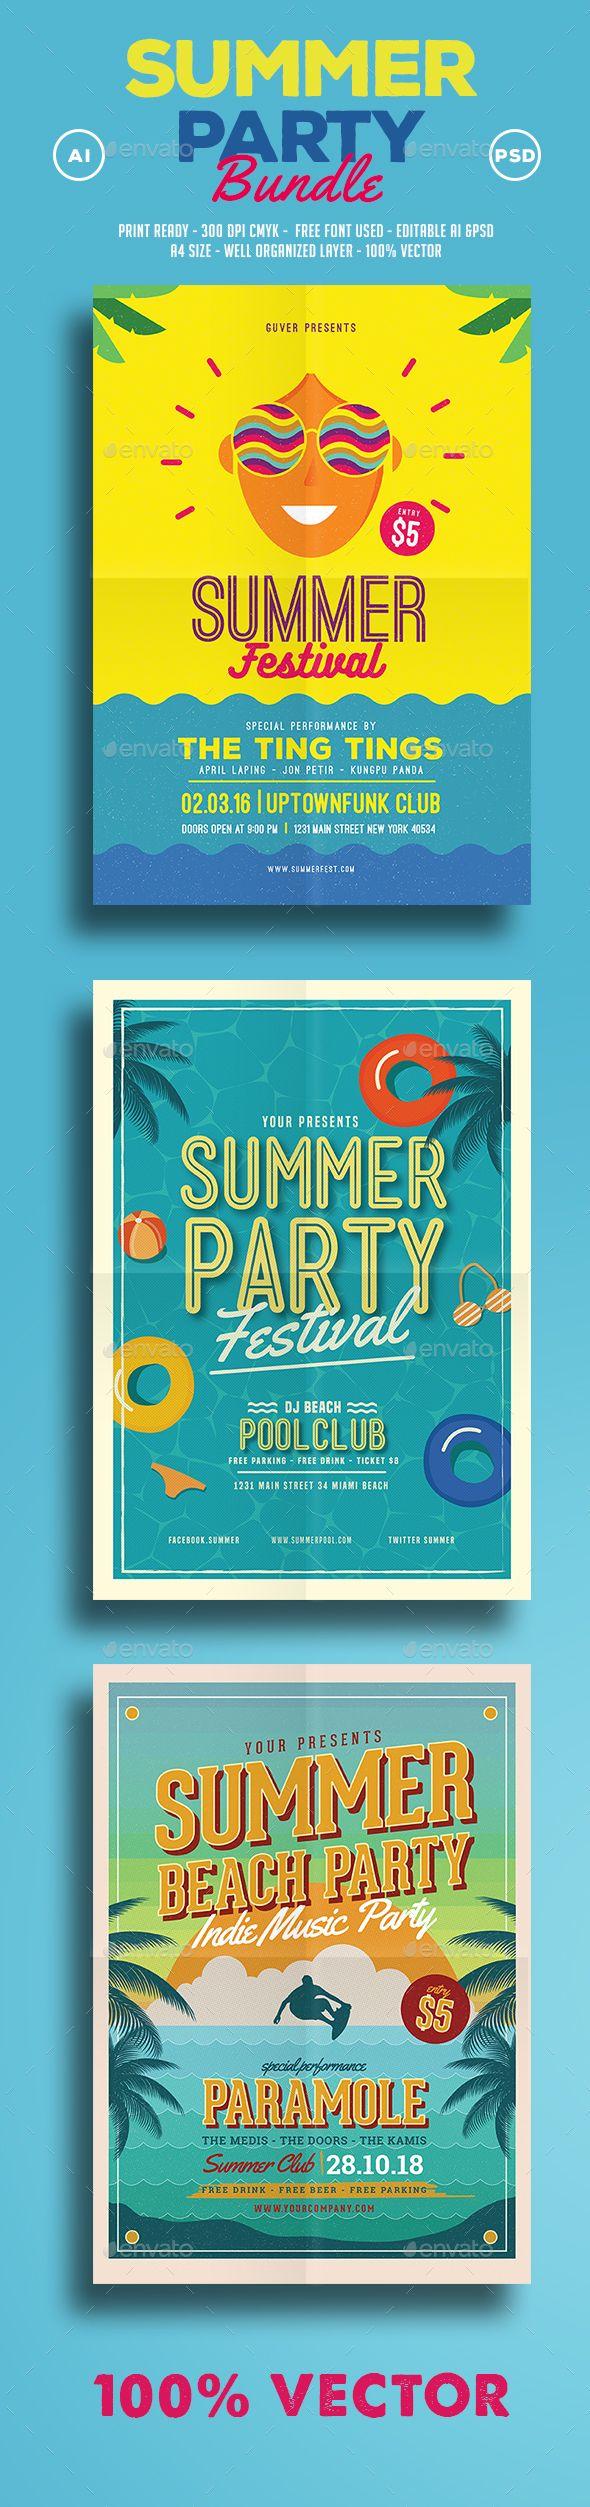 Summer Festival Templates PSD, AI Illustrator Bundle. Download here: https://graphicriver.net/item/summer-festival-bundle/17374606?ref=ksioks